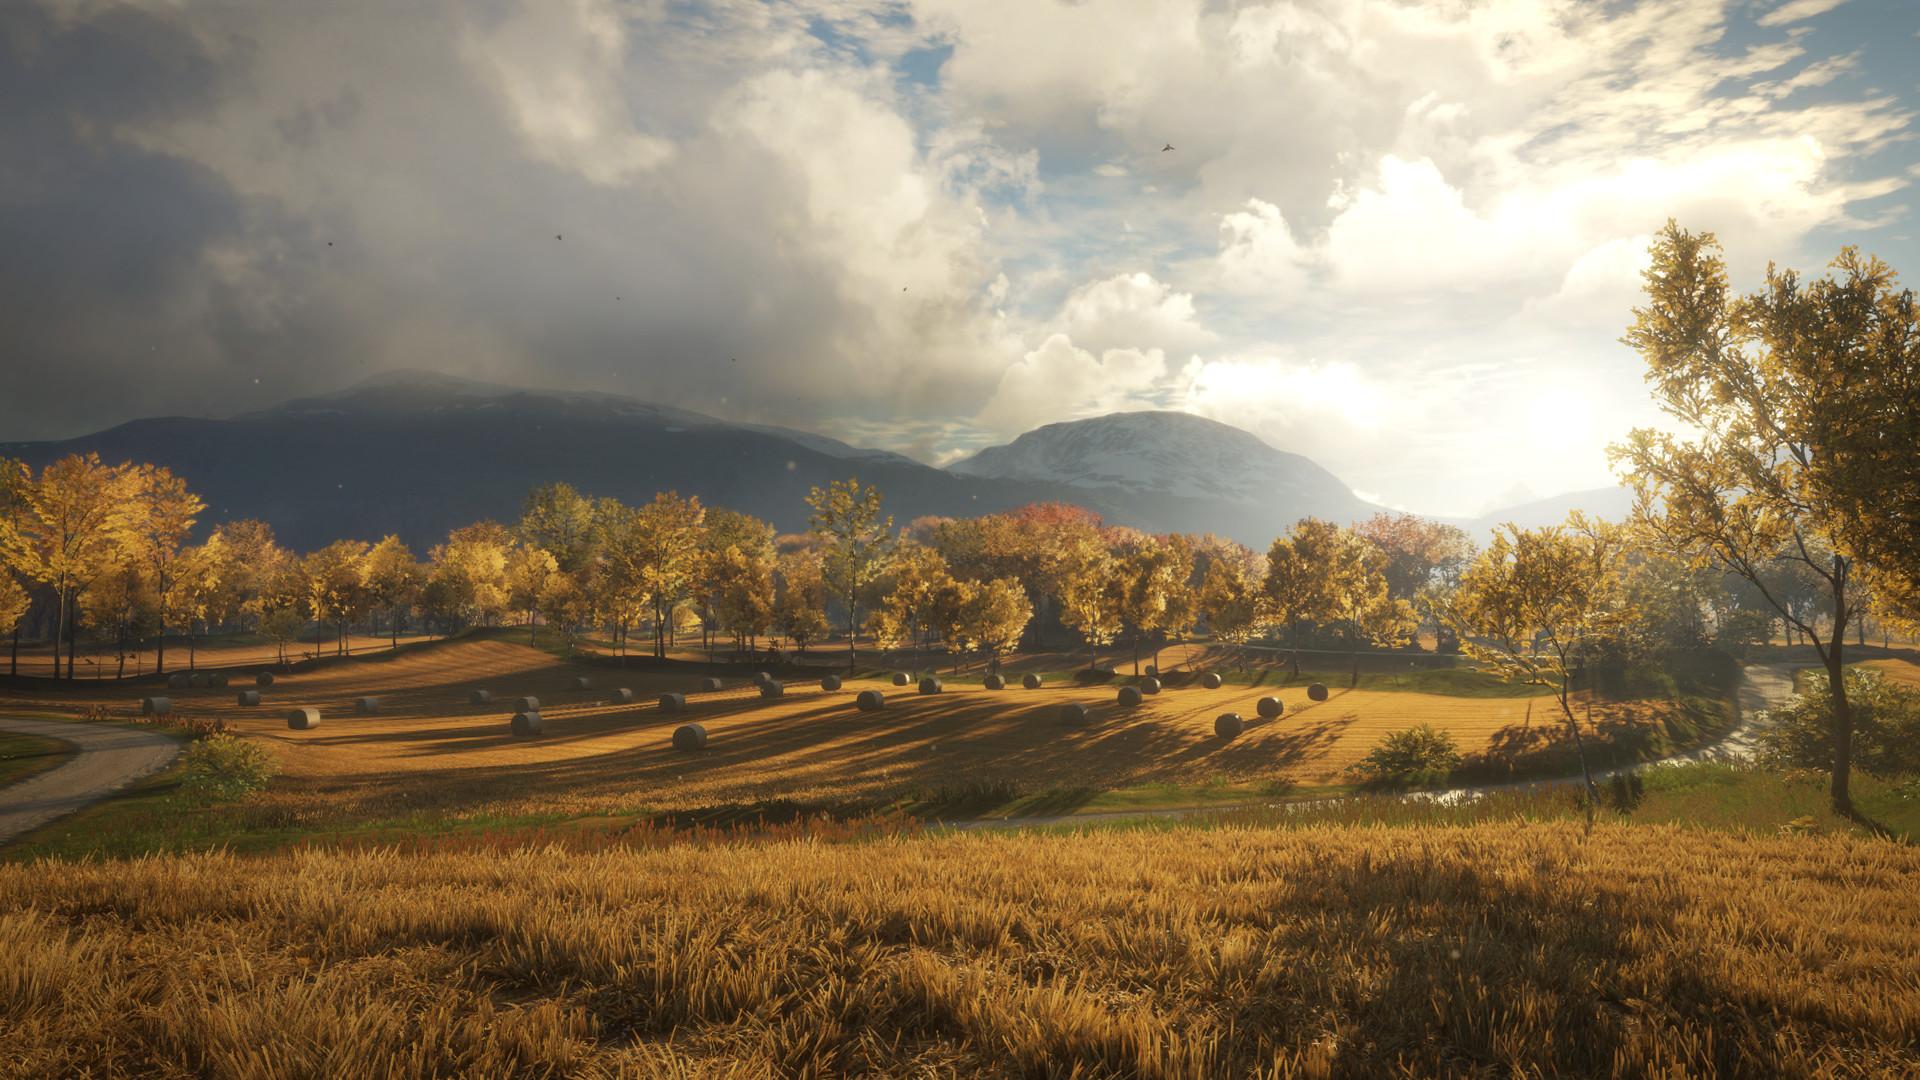 Free Photo Wild Nature Mountainous Landscape Free Download